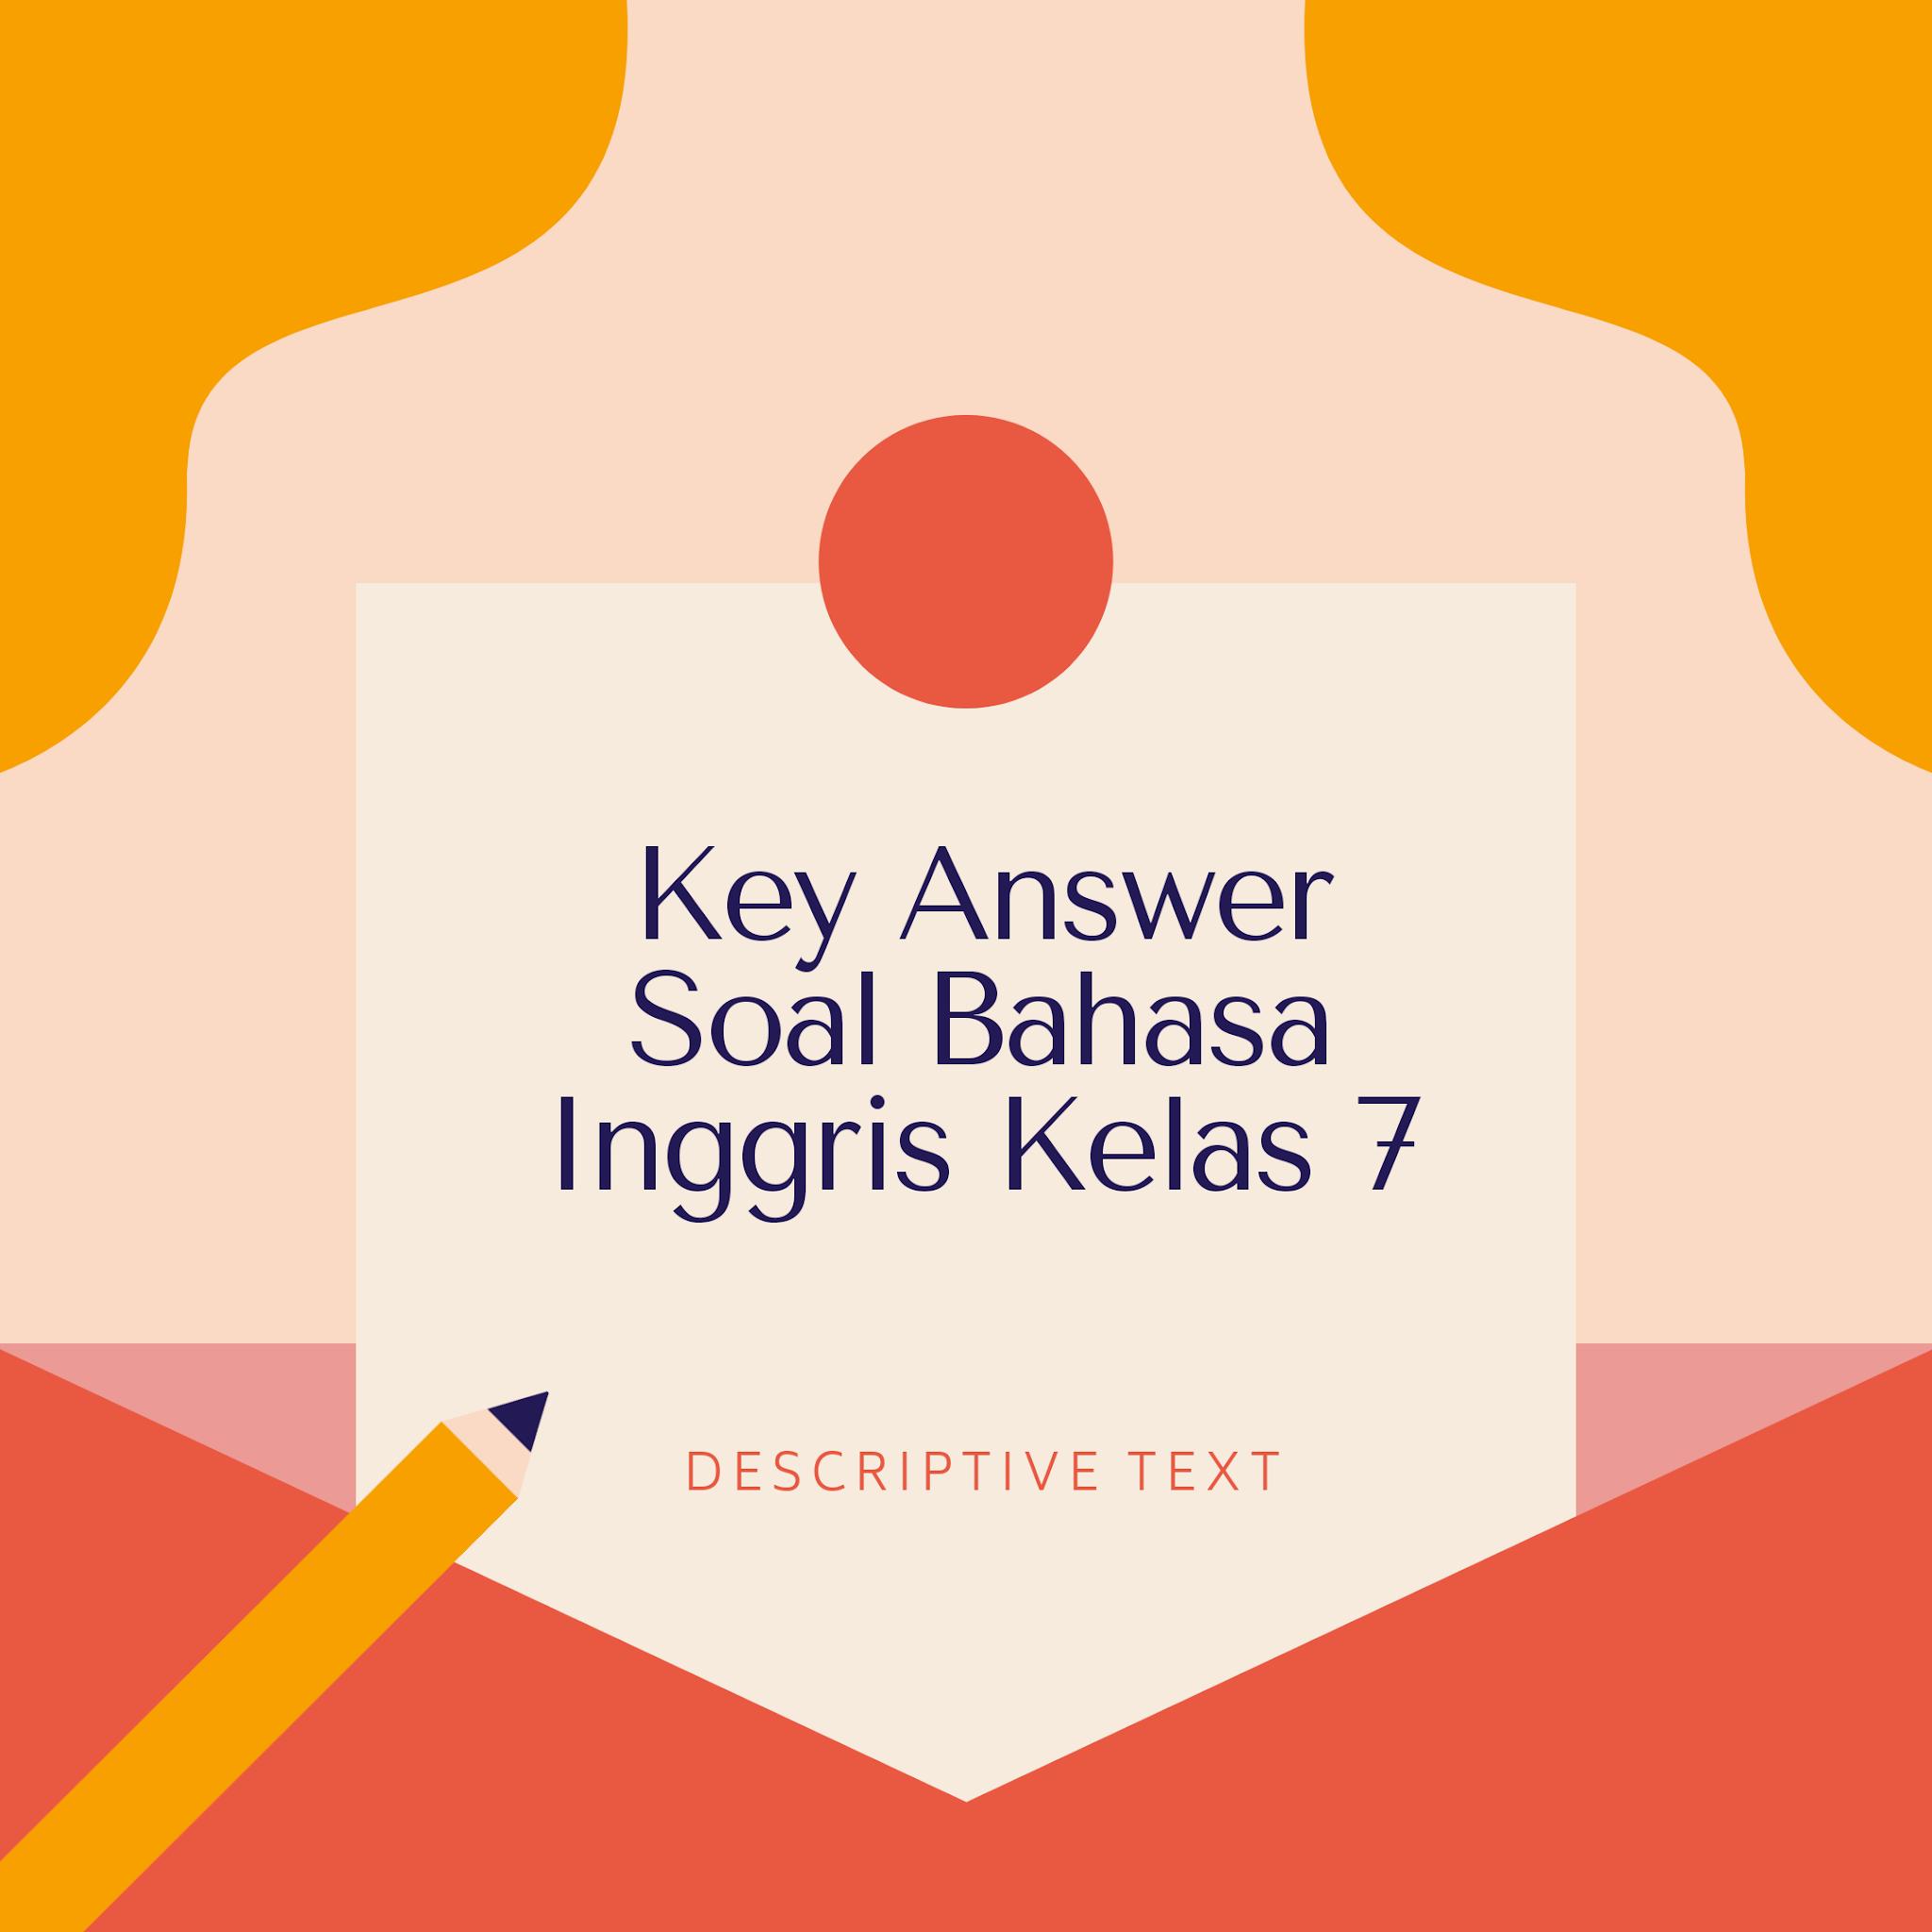 Akm dan implikasinya dalam pembelajaran (pdf). Descriptive Texts Contoh Soal Bahasa Inggris Smp Mts Kelas 7 Dengan Jawaban Mediainggris